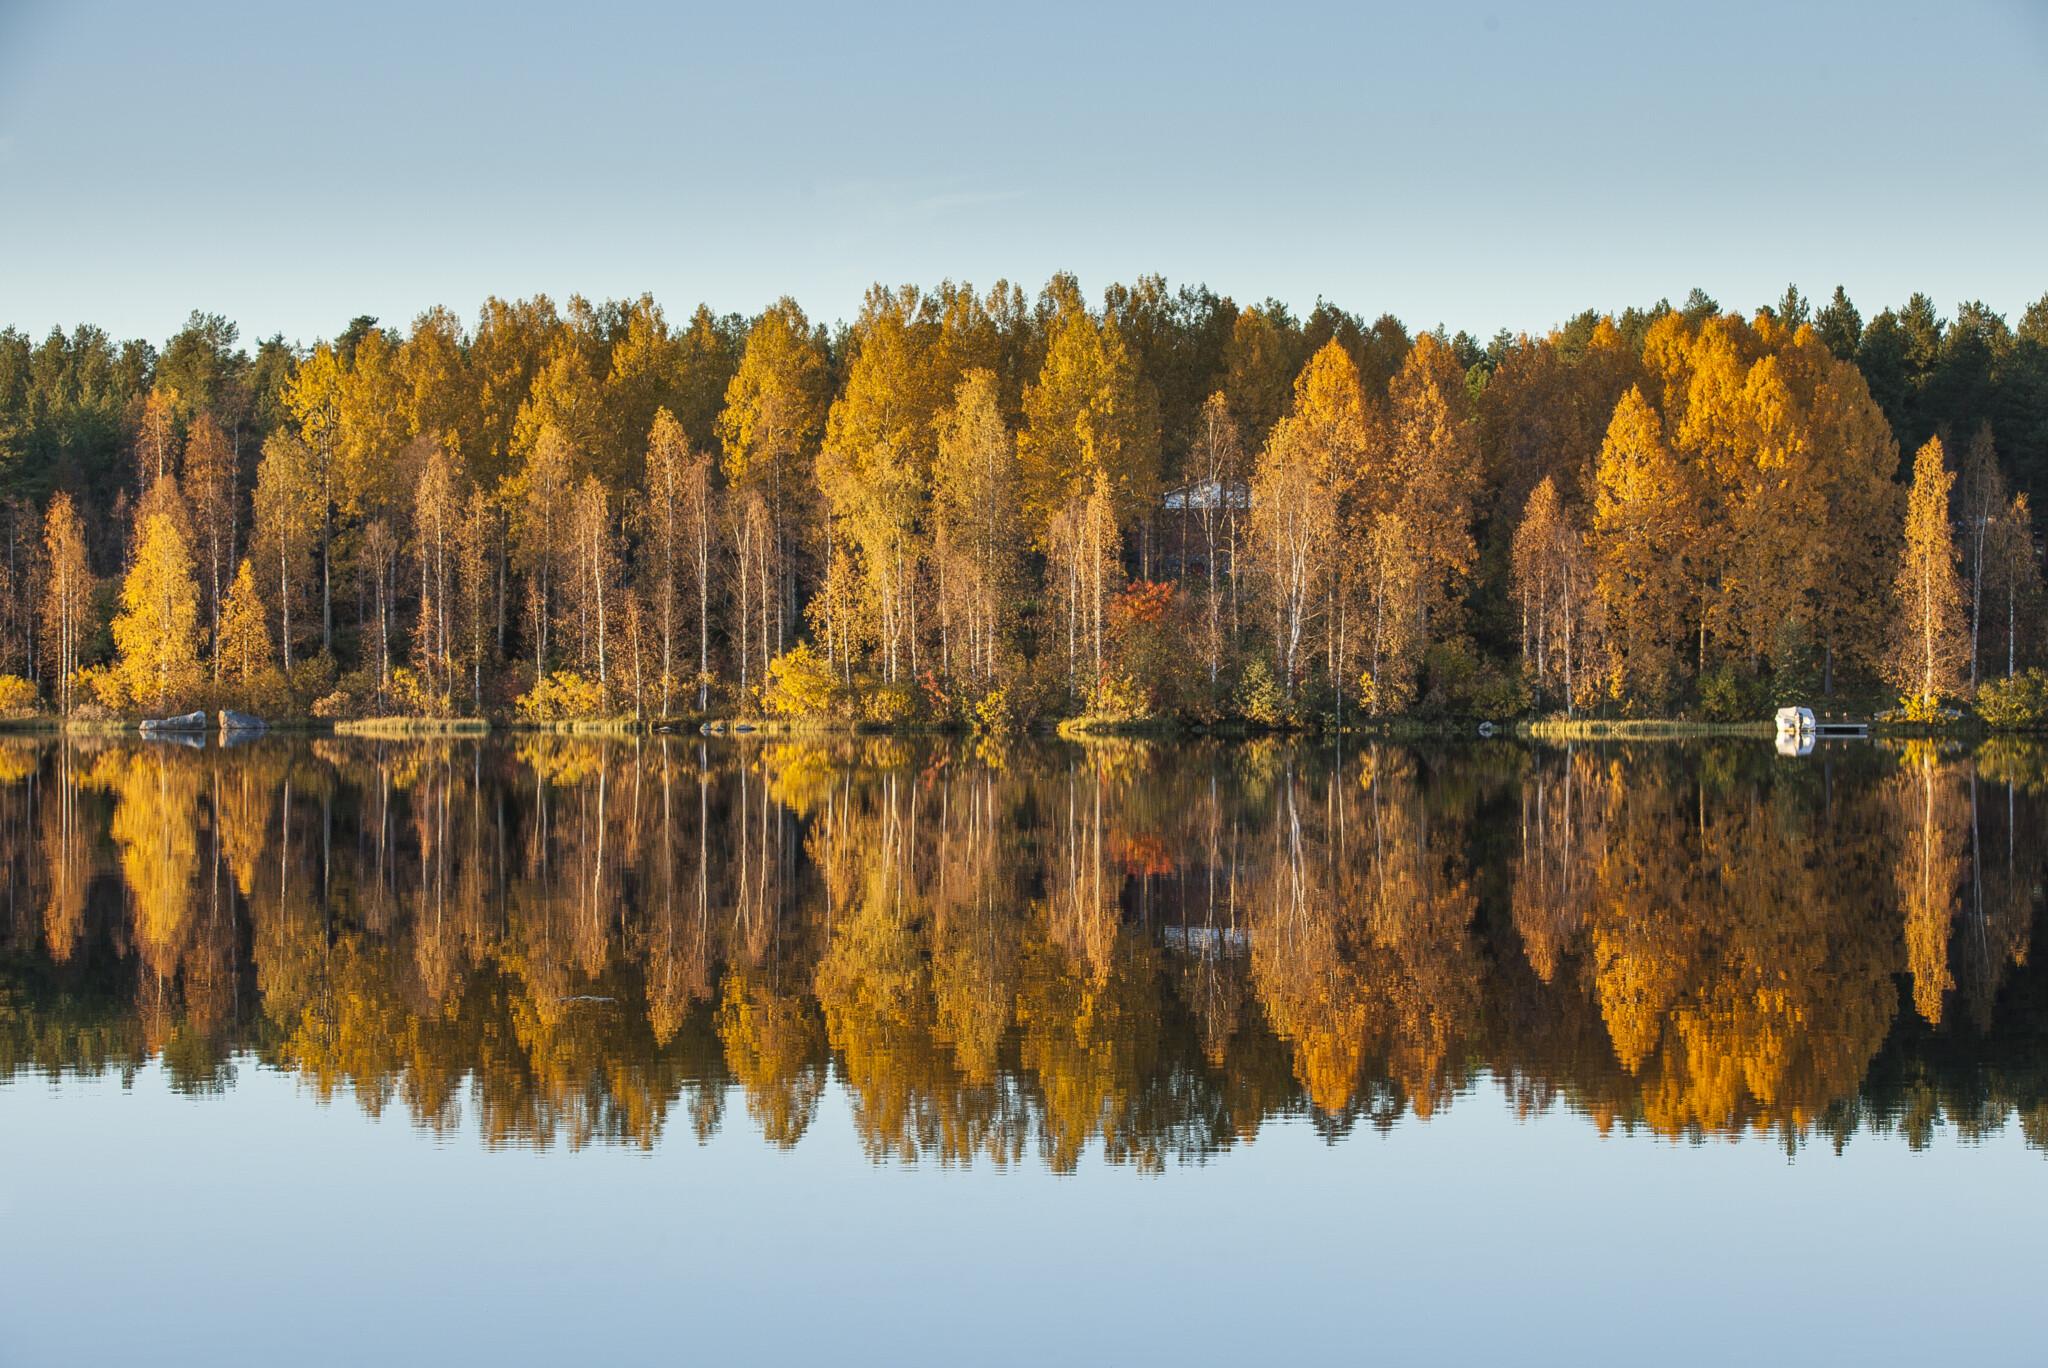 autumn-colours-reflection-Rovaniemi-Lapland-Finland-photo-Alexander-Kuznetsov